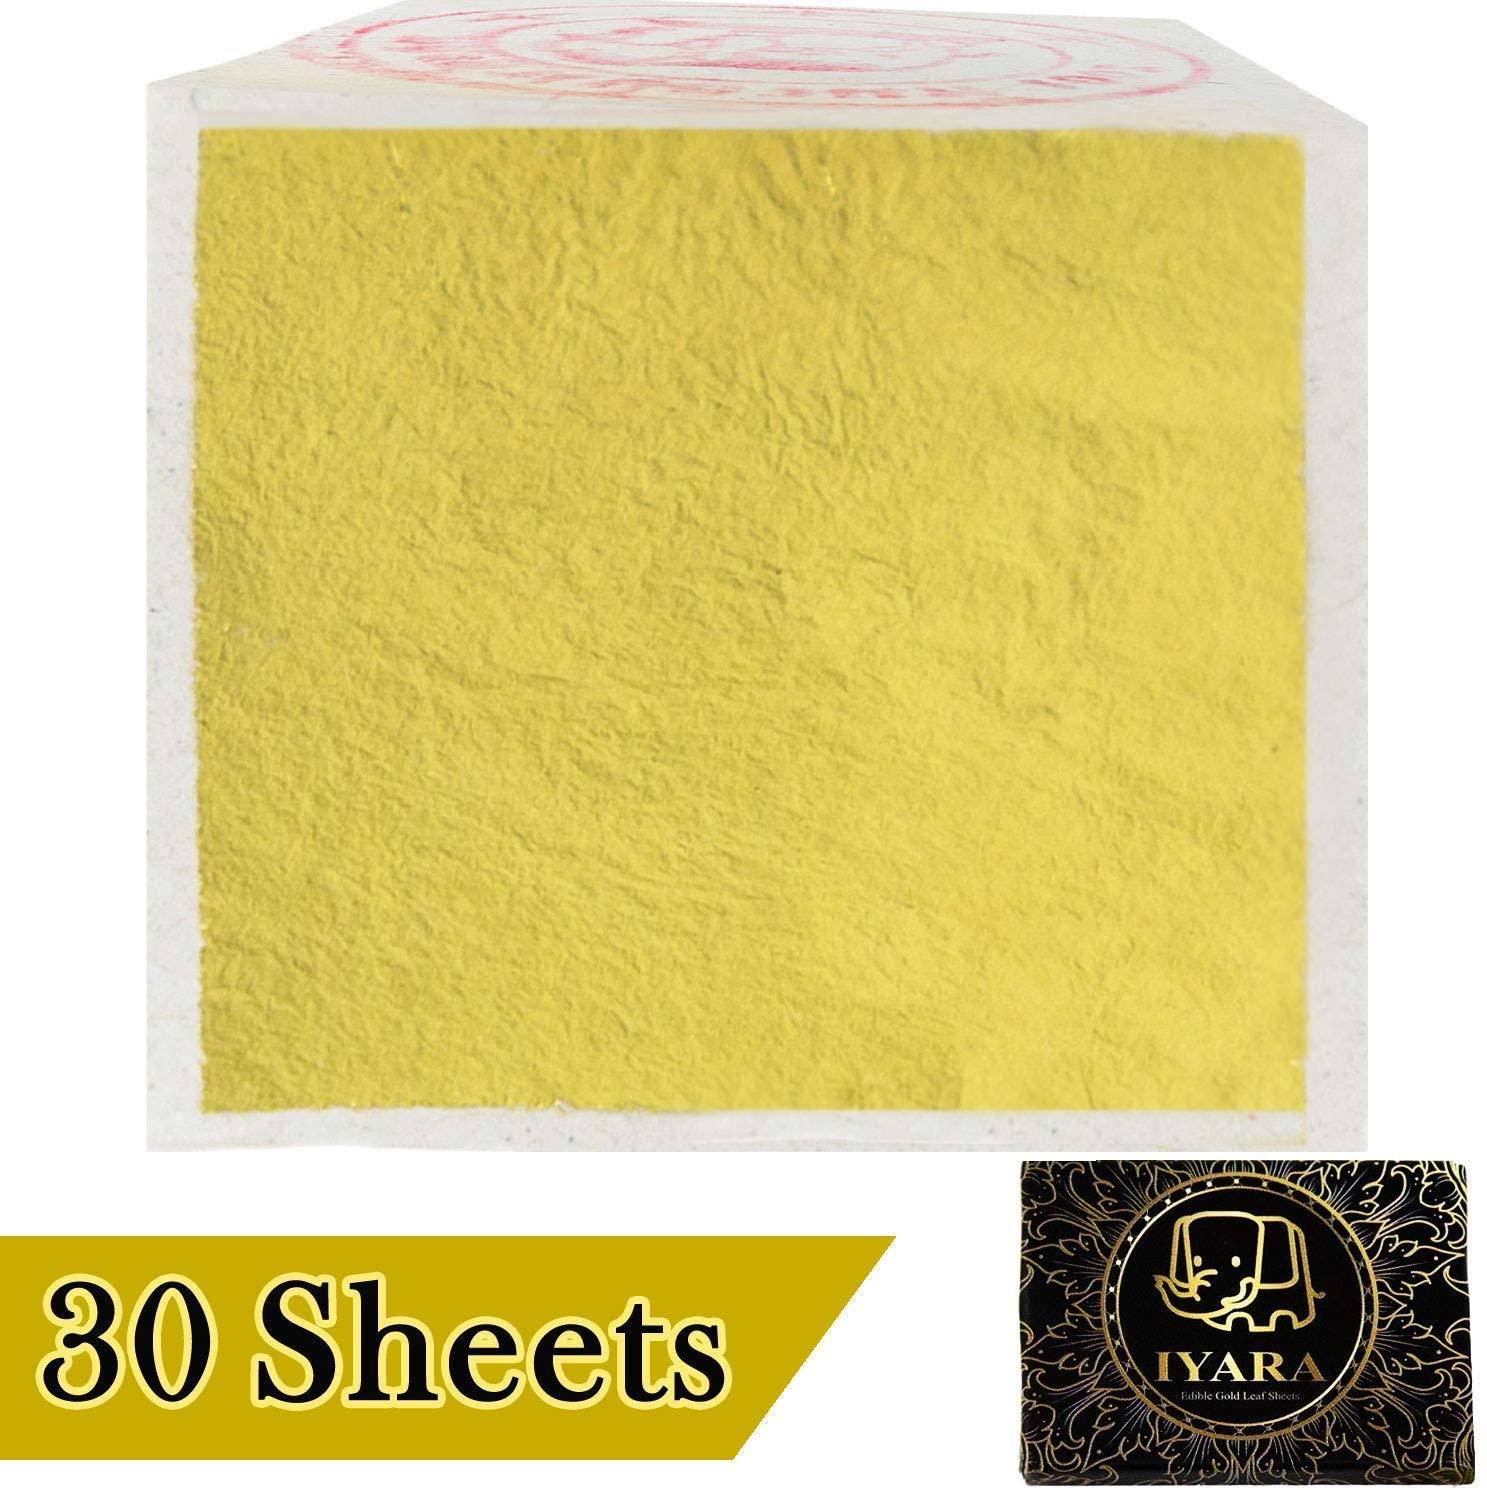 IYARA 30 Edible Gold Leaf Sheets – Multipurpose 24 Karat Yellow Leaves for Food and Cake Decoration, Spa Anti-Wrinkle Face Masks, Art, Crafts, Gilding, Restoration, DIY Projects (1.2